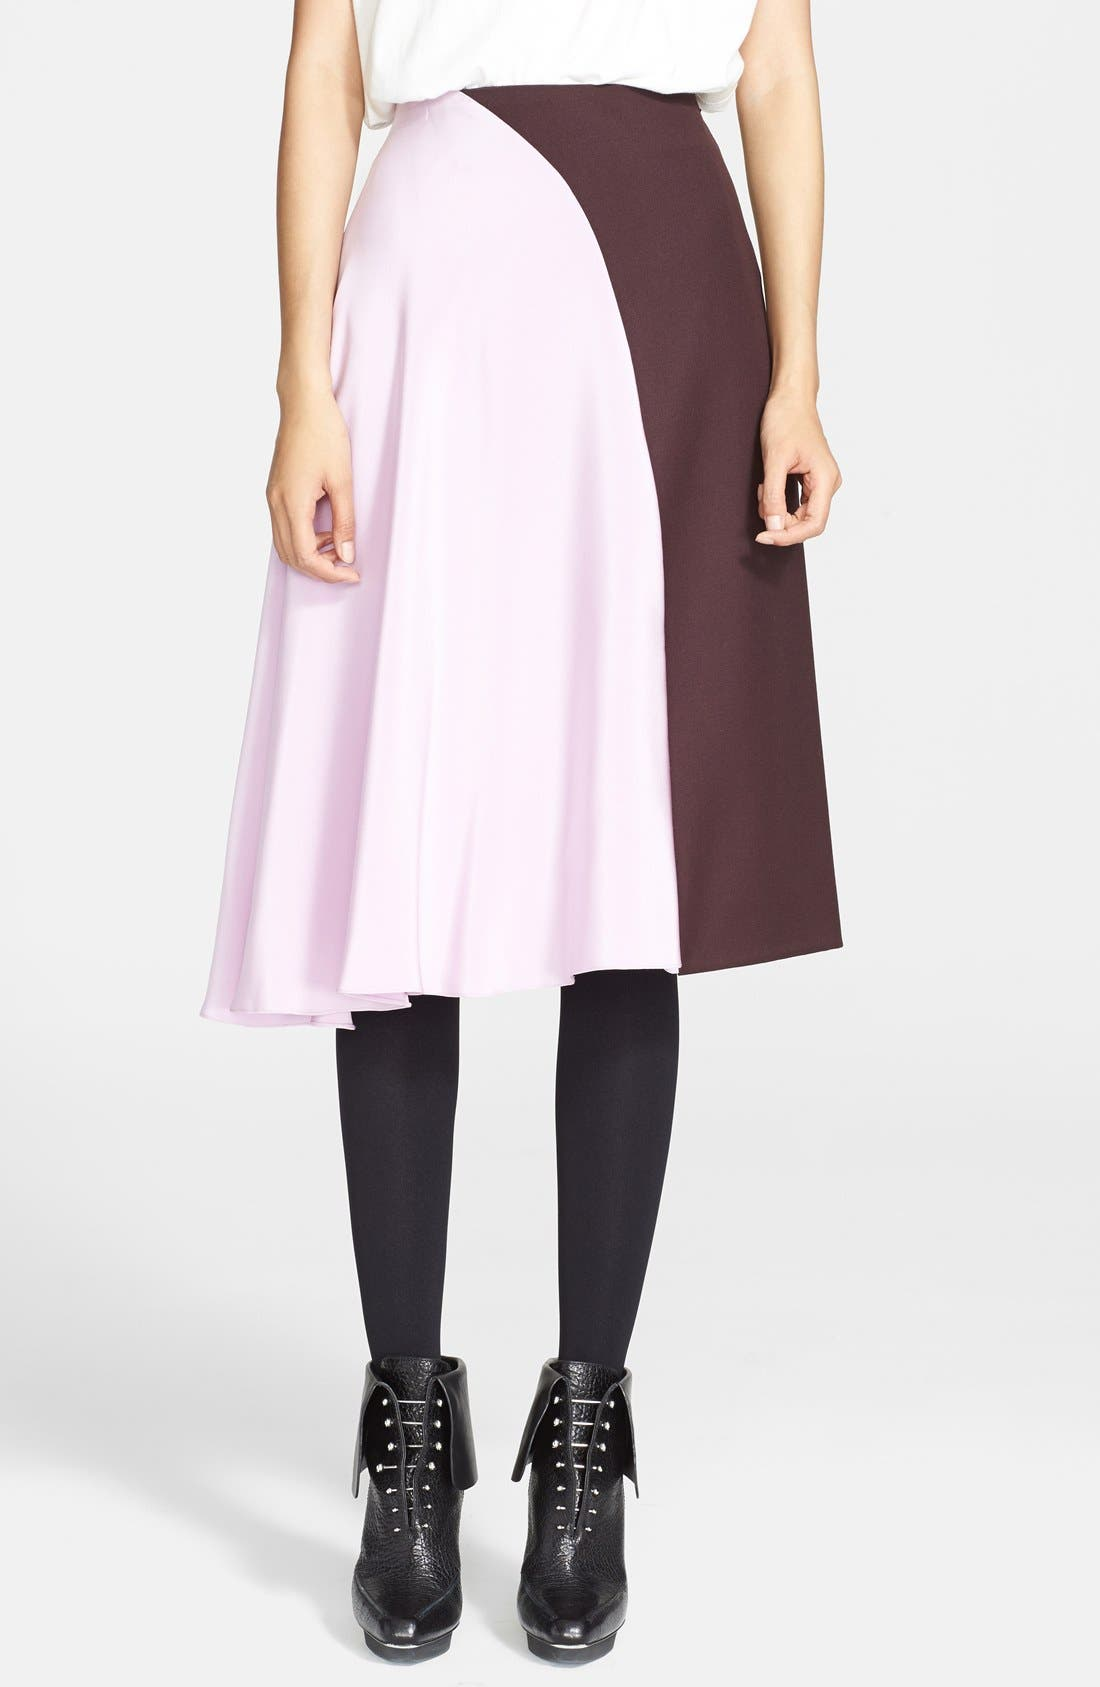 Main Image - 3.1 Phillip Lim 'Horizon' Wool & Crêpe de Chine Skirt